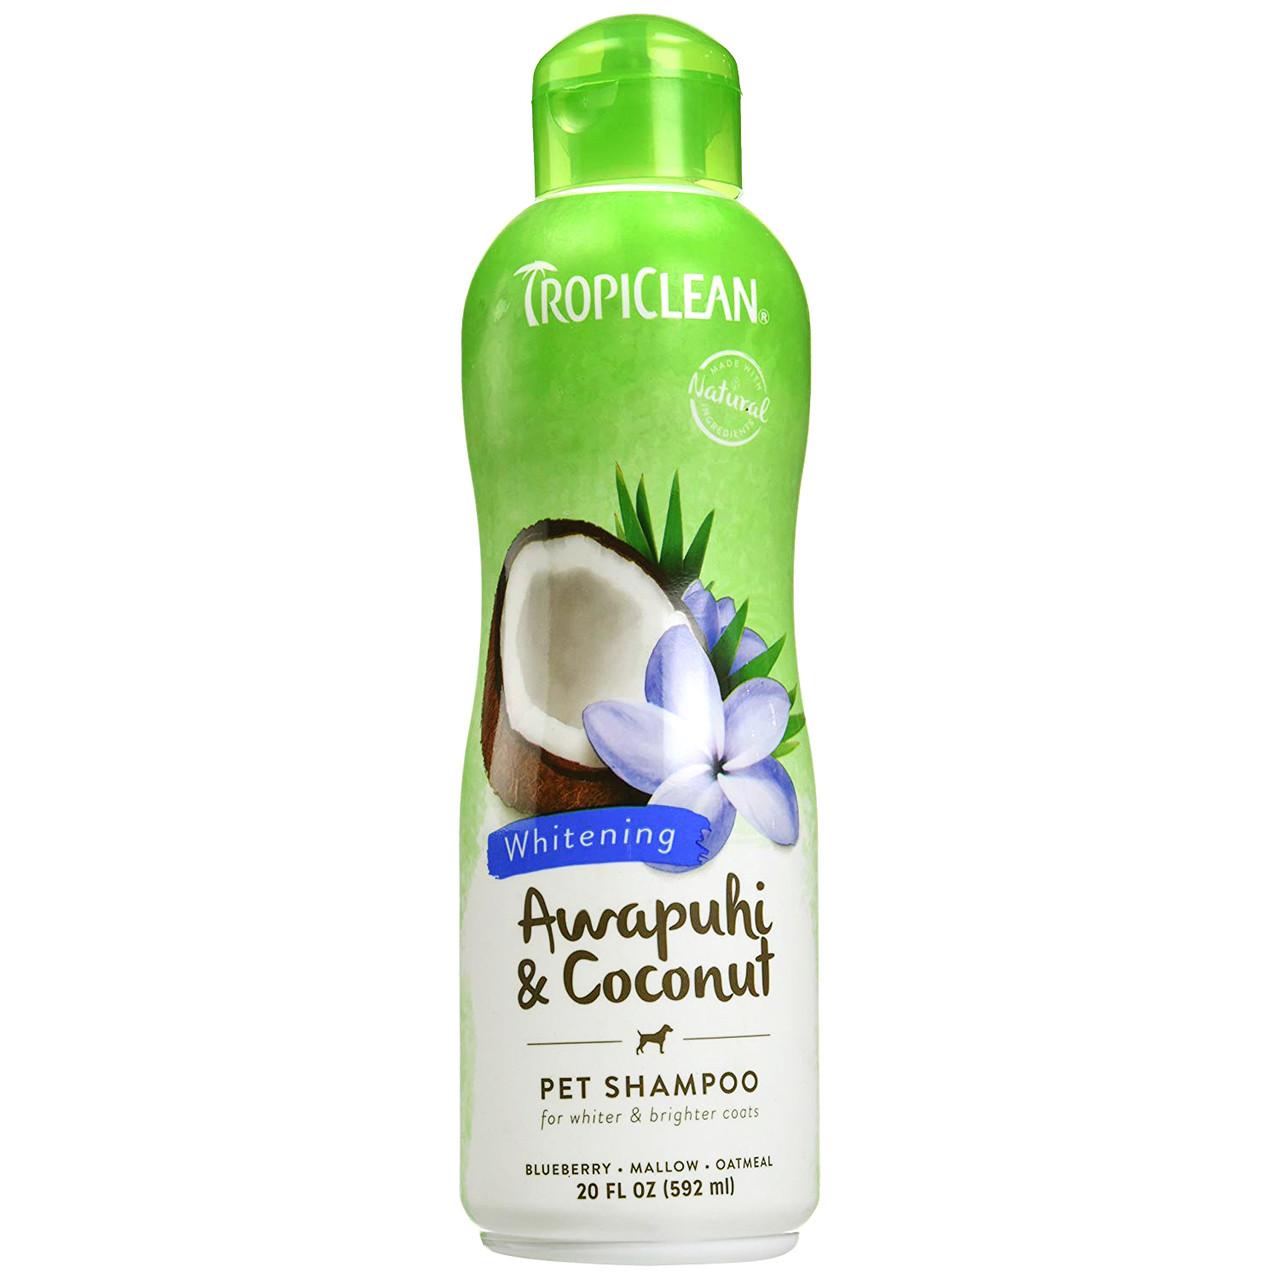 TropiClean Awapuhi & Coconut Whitening Pet Shampoo